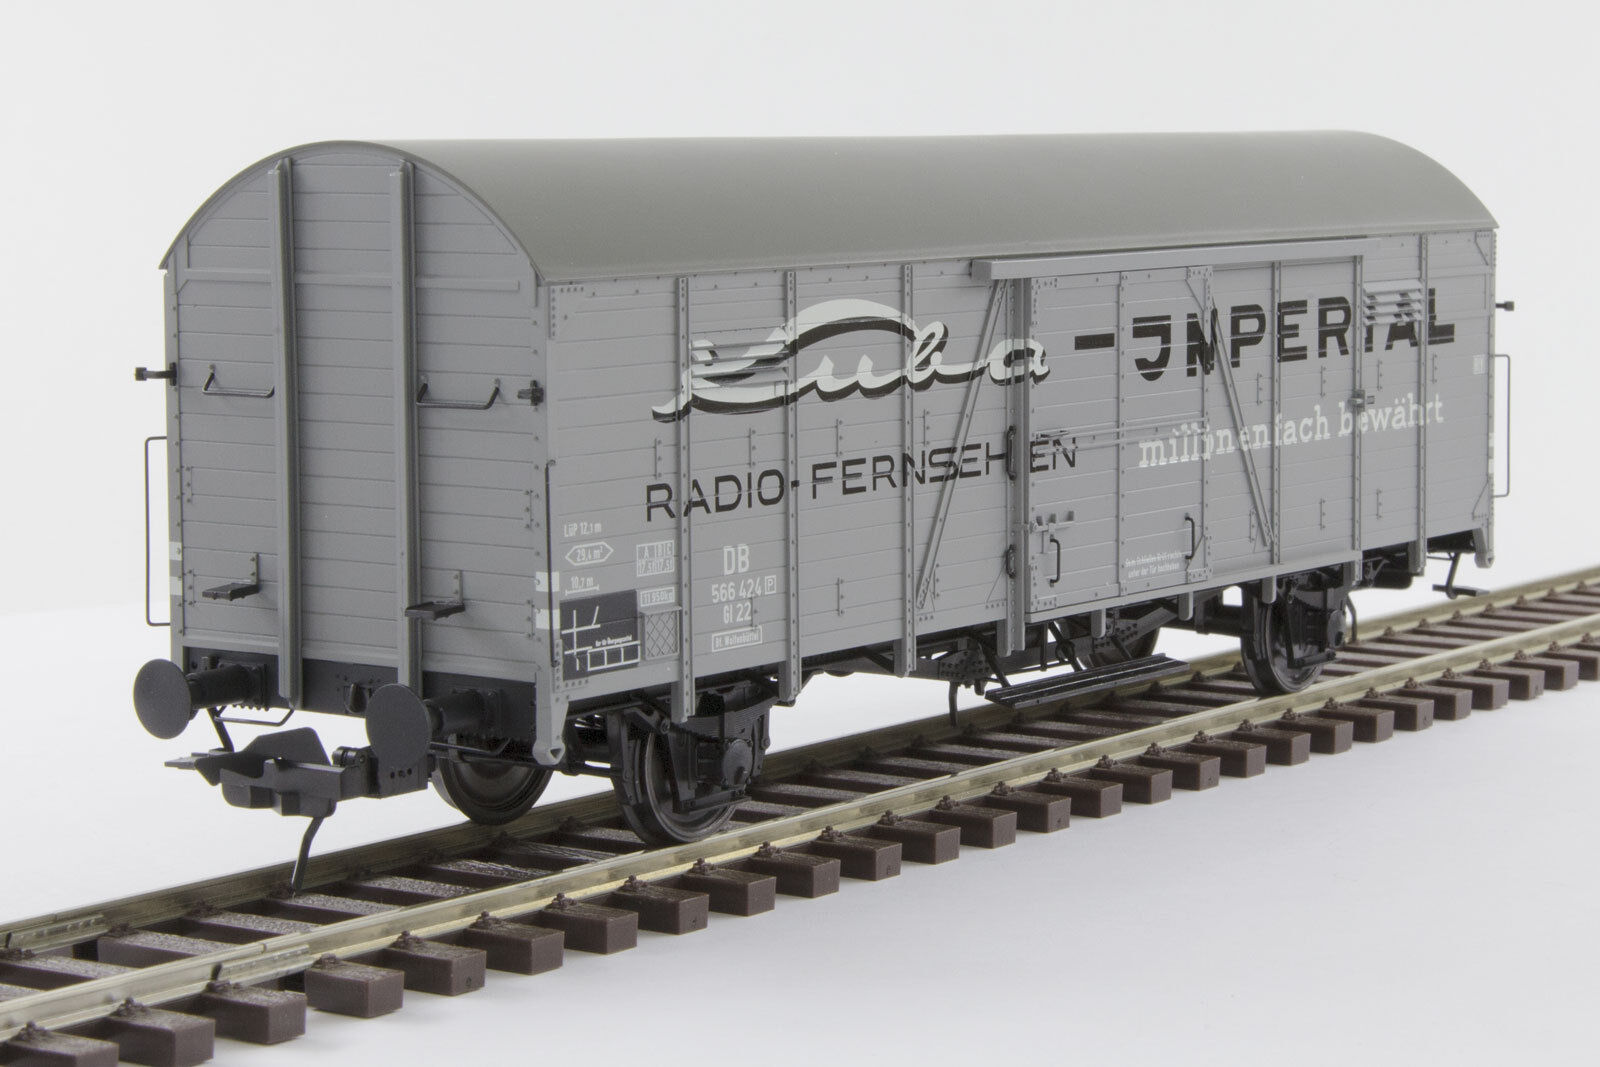 Lenz 42212-03 carri merci gl22 Dresda 566 424 DB Cuba Imperial traccia 0